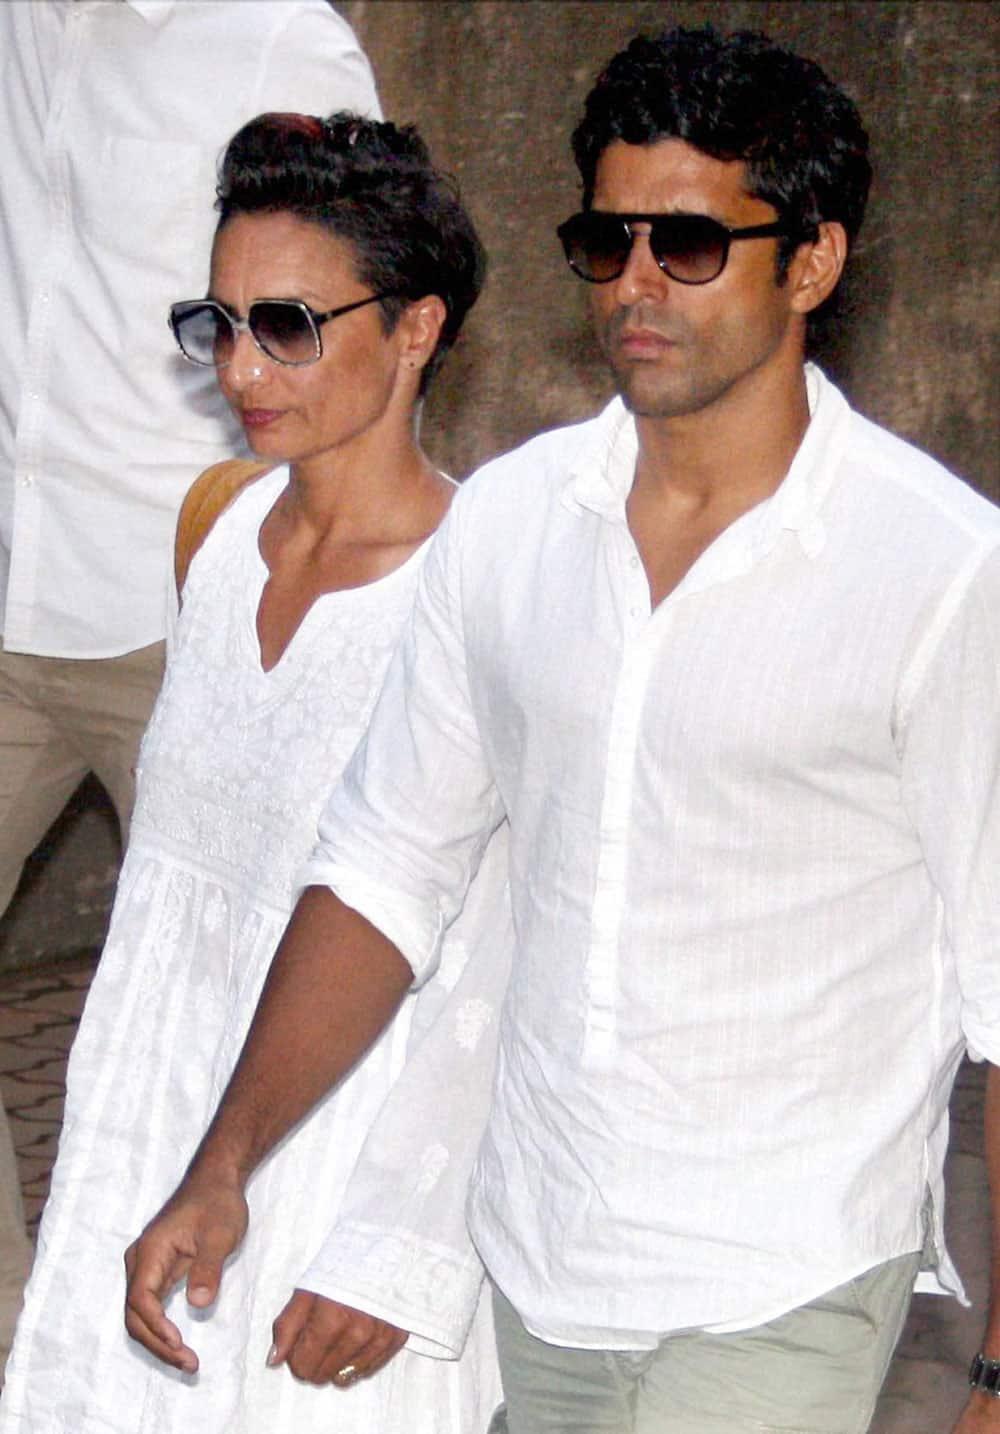 Farhan Akhtar with wife Adhuna Akhtar attend funeral of actor Farooq Shaikh in Mumbai.